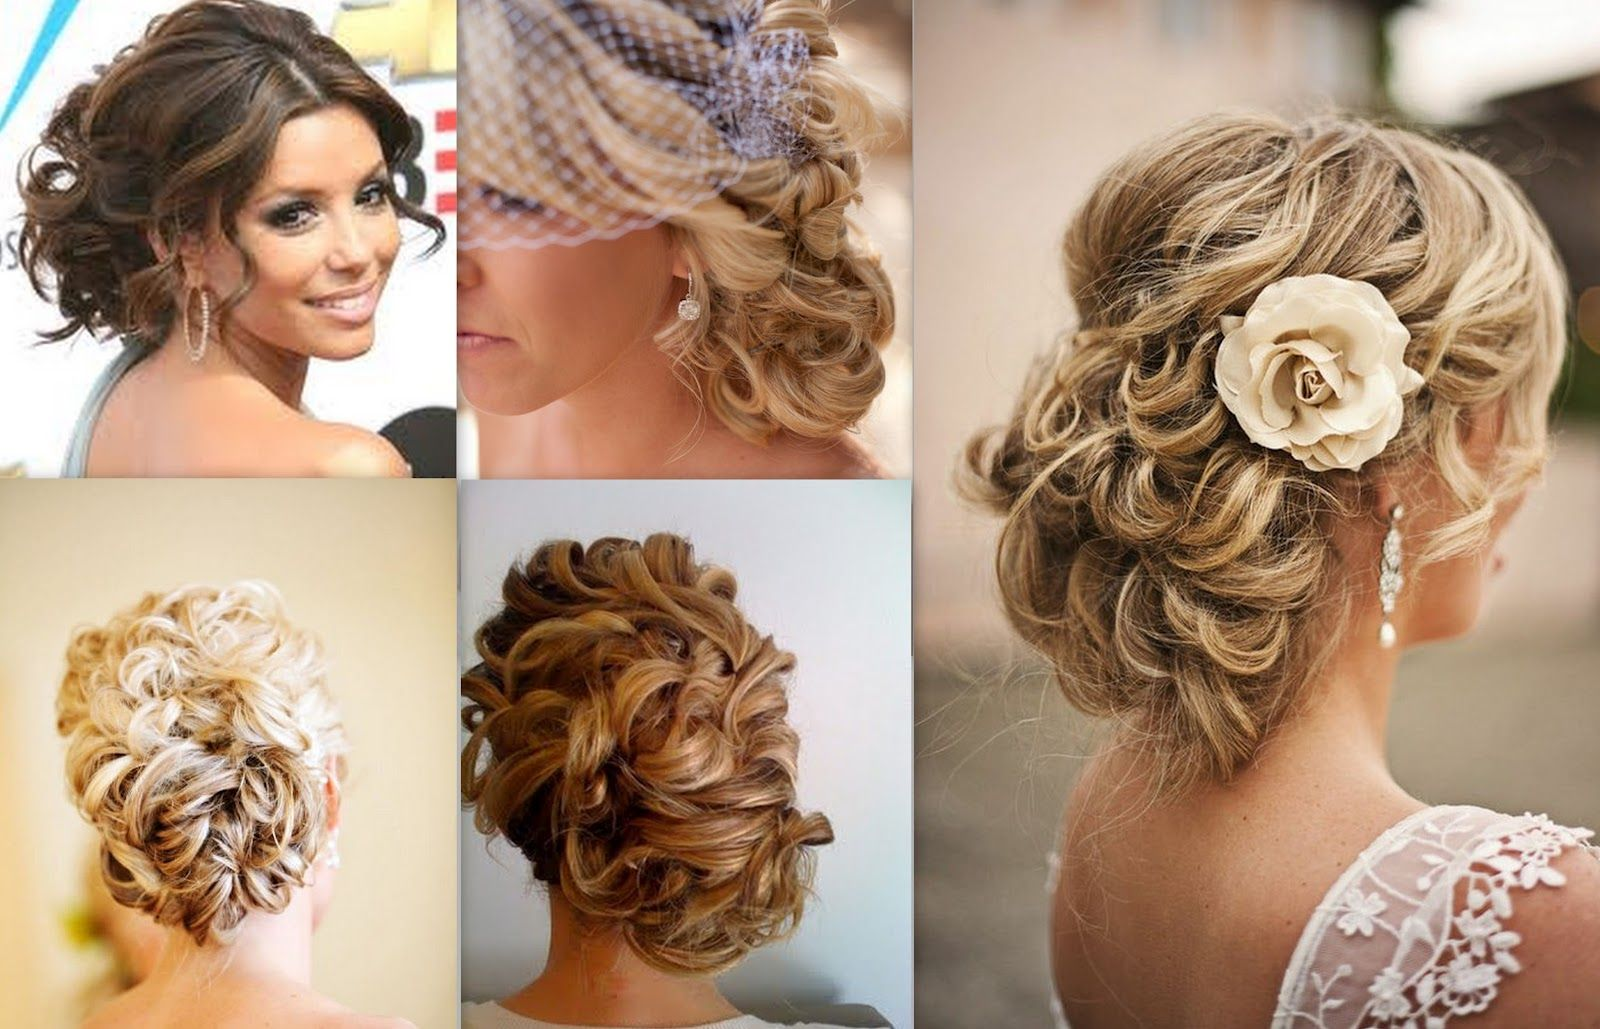 wedding hairstyles HD Wallpapers Download Free wedding hairstyles ...